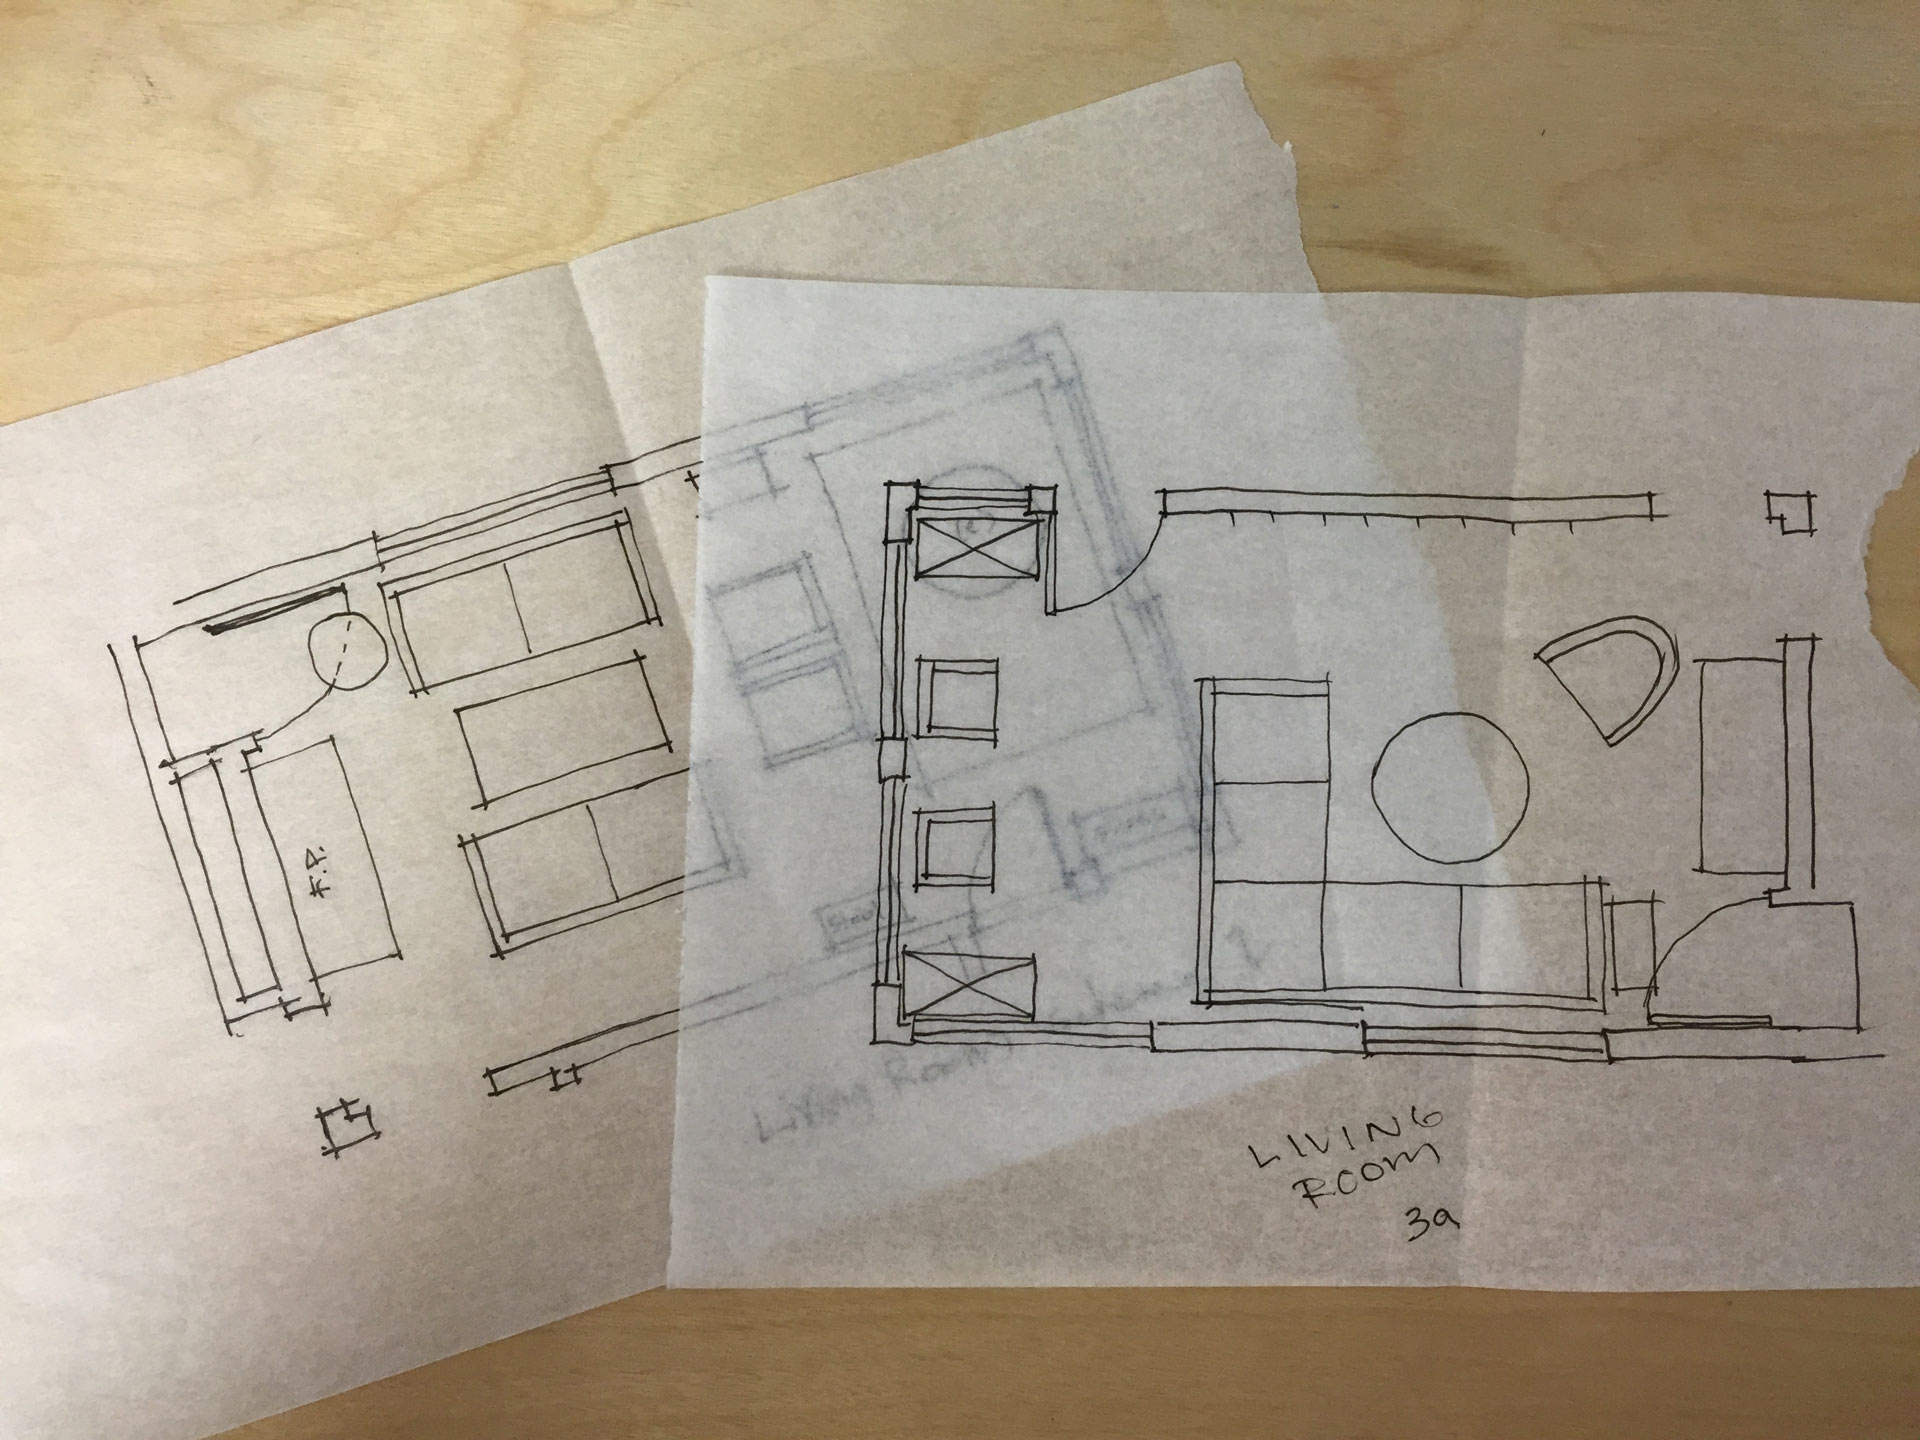 schematic-overlays